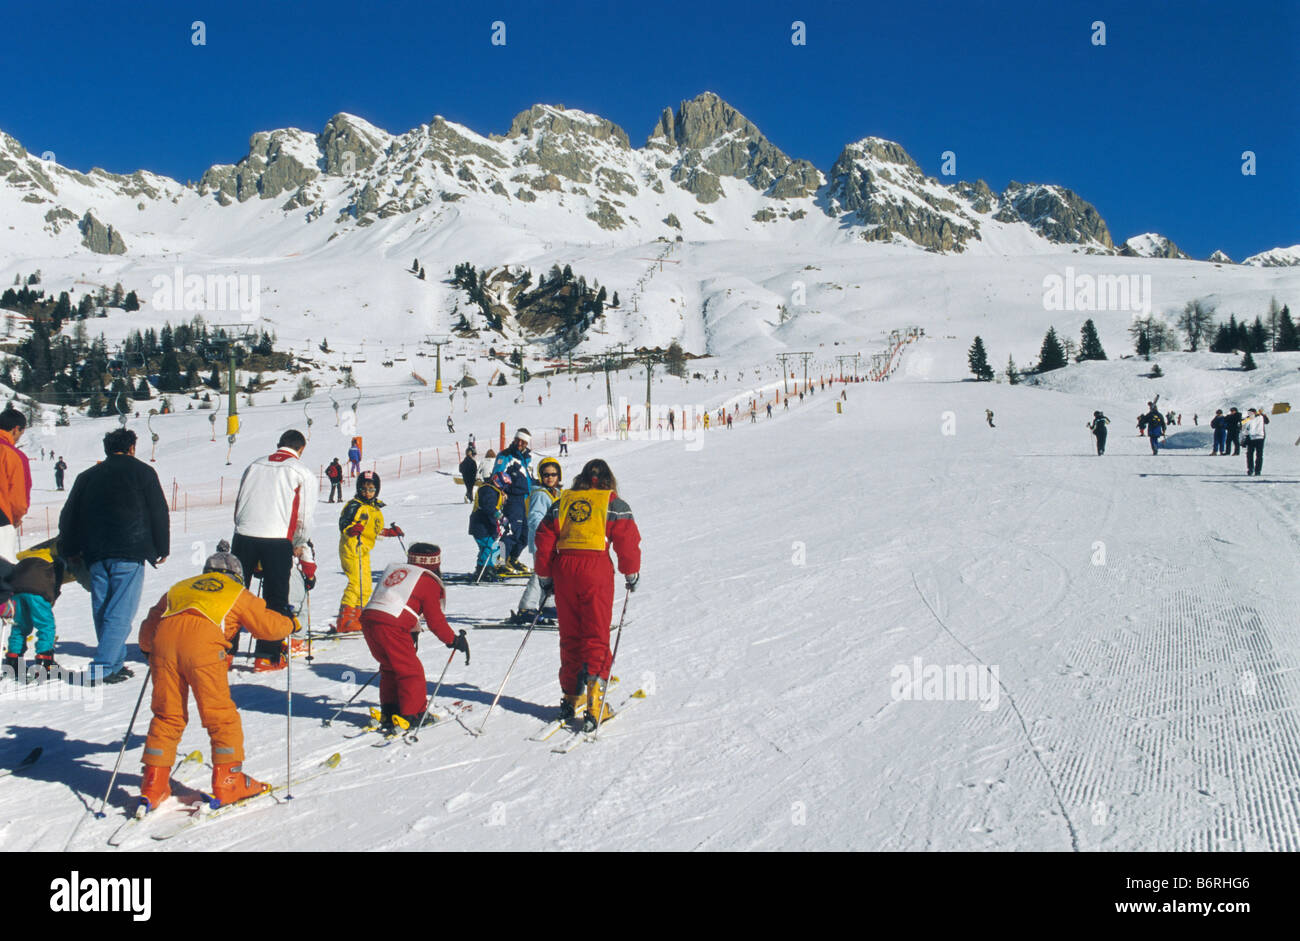 Skiing area at Passo di San Pelegrino in Marmolada mountain group in winter Dolomites Trentino Alto Adige region Stock Photo